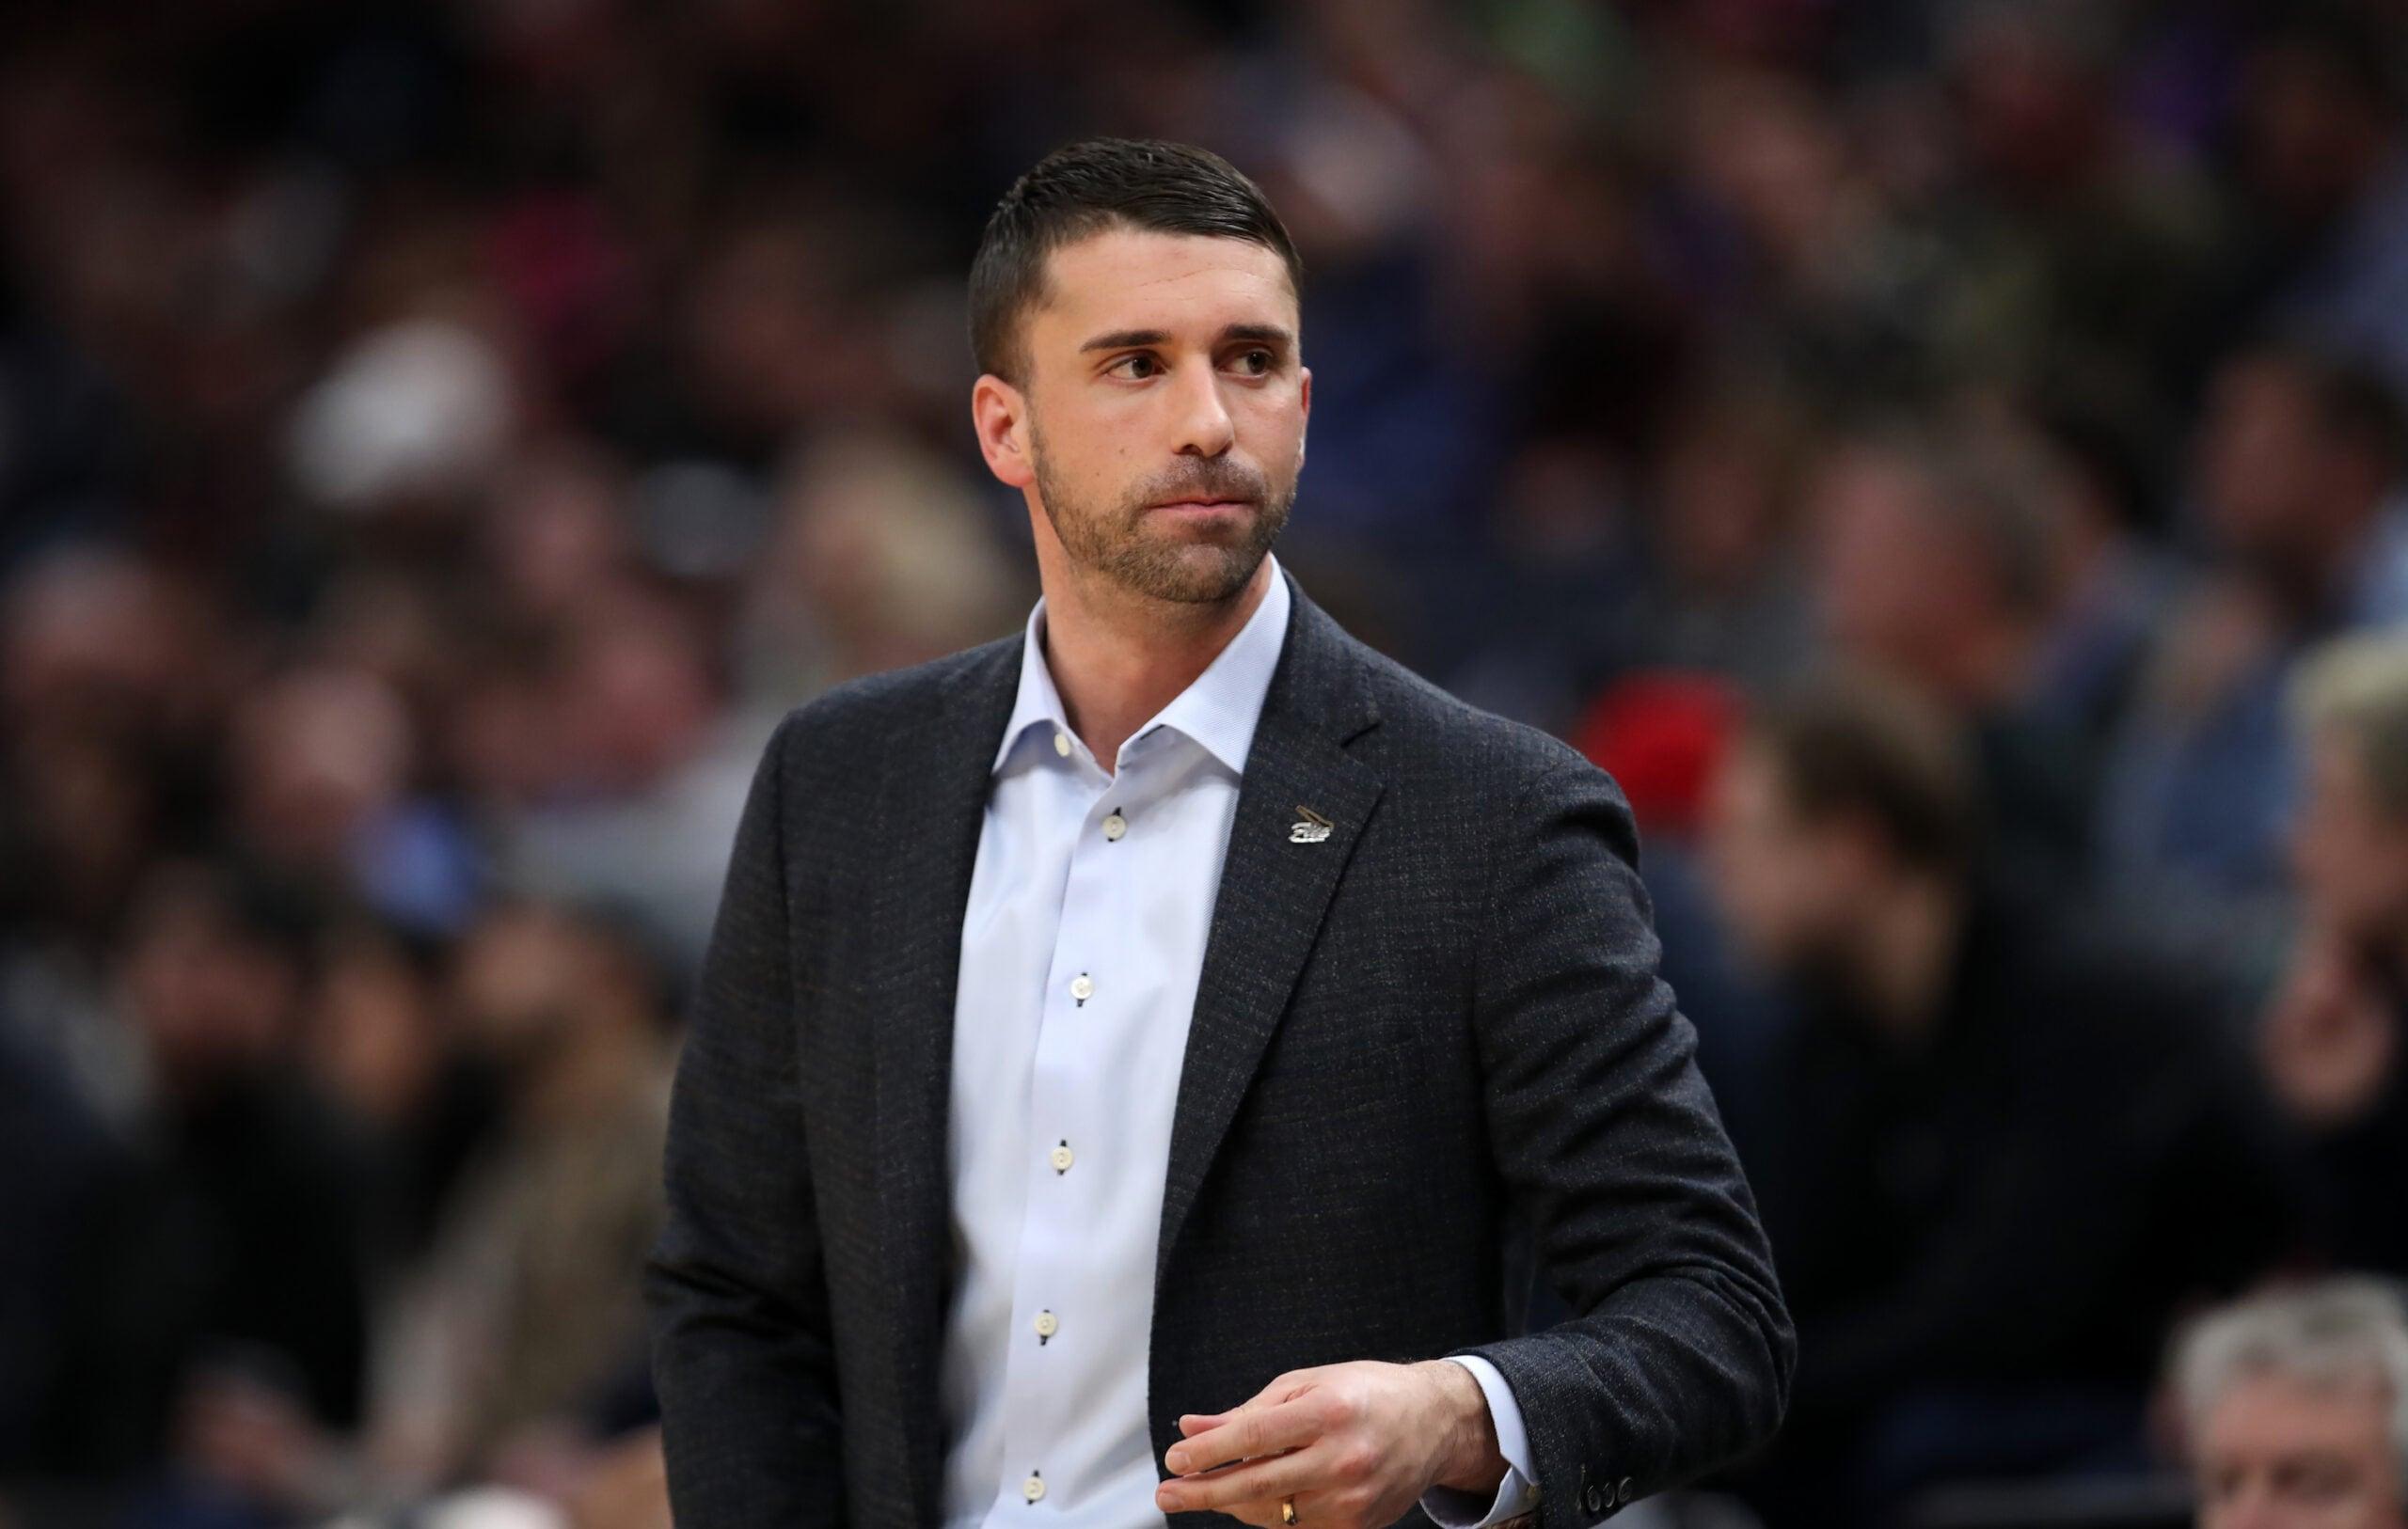 Timberwolves relieve Ryan Saunders of head coaching duties